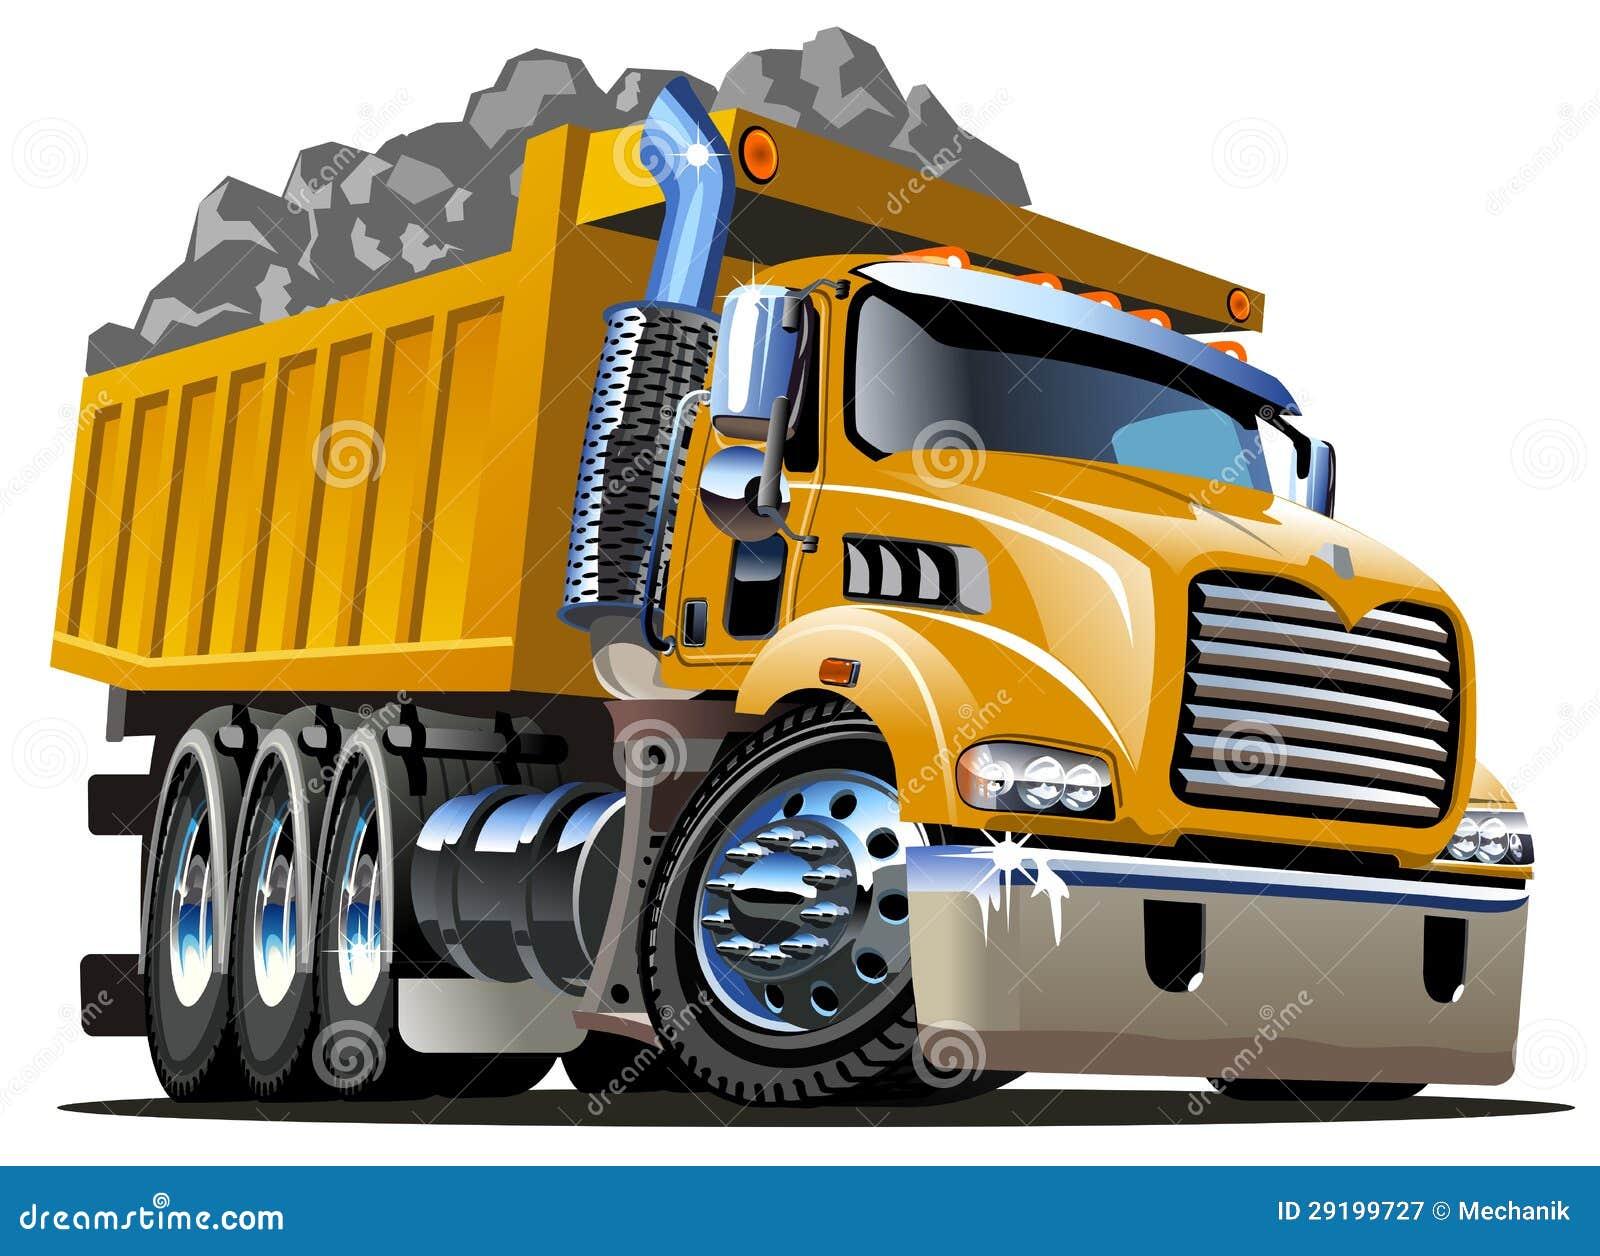 yellow truck clipart - photo #49